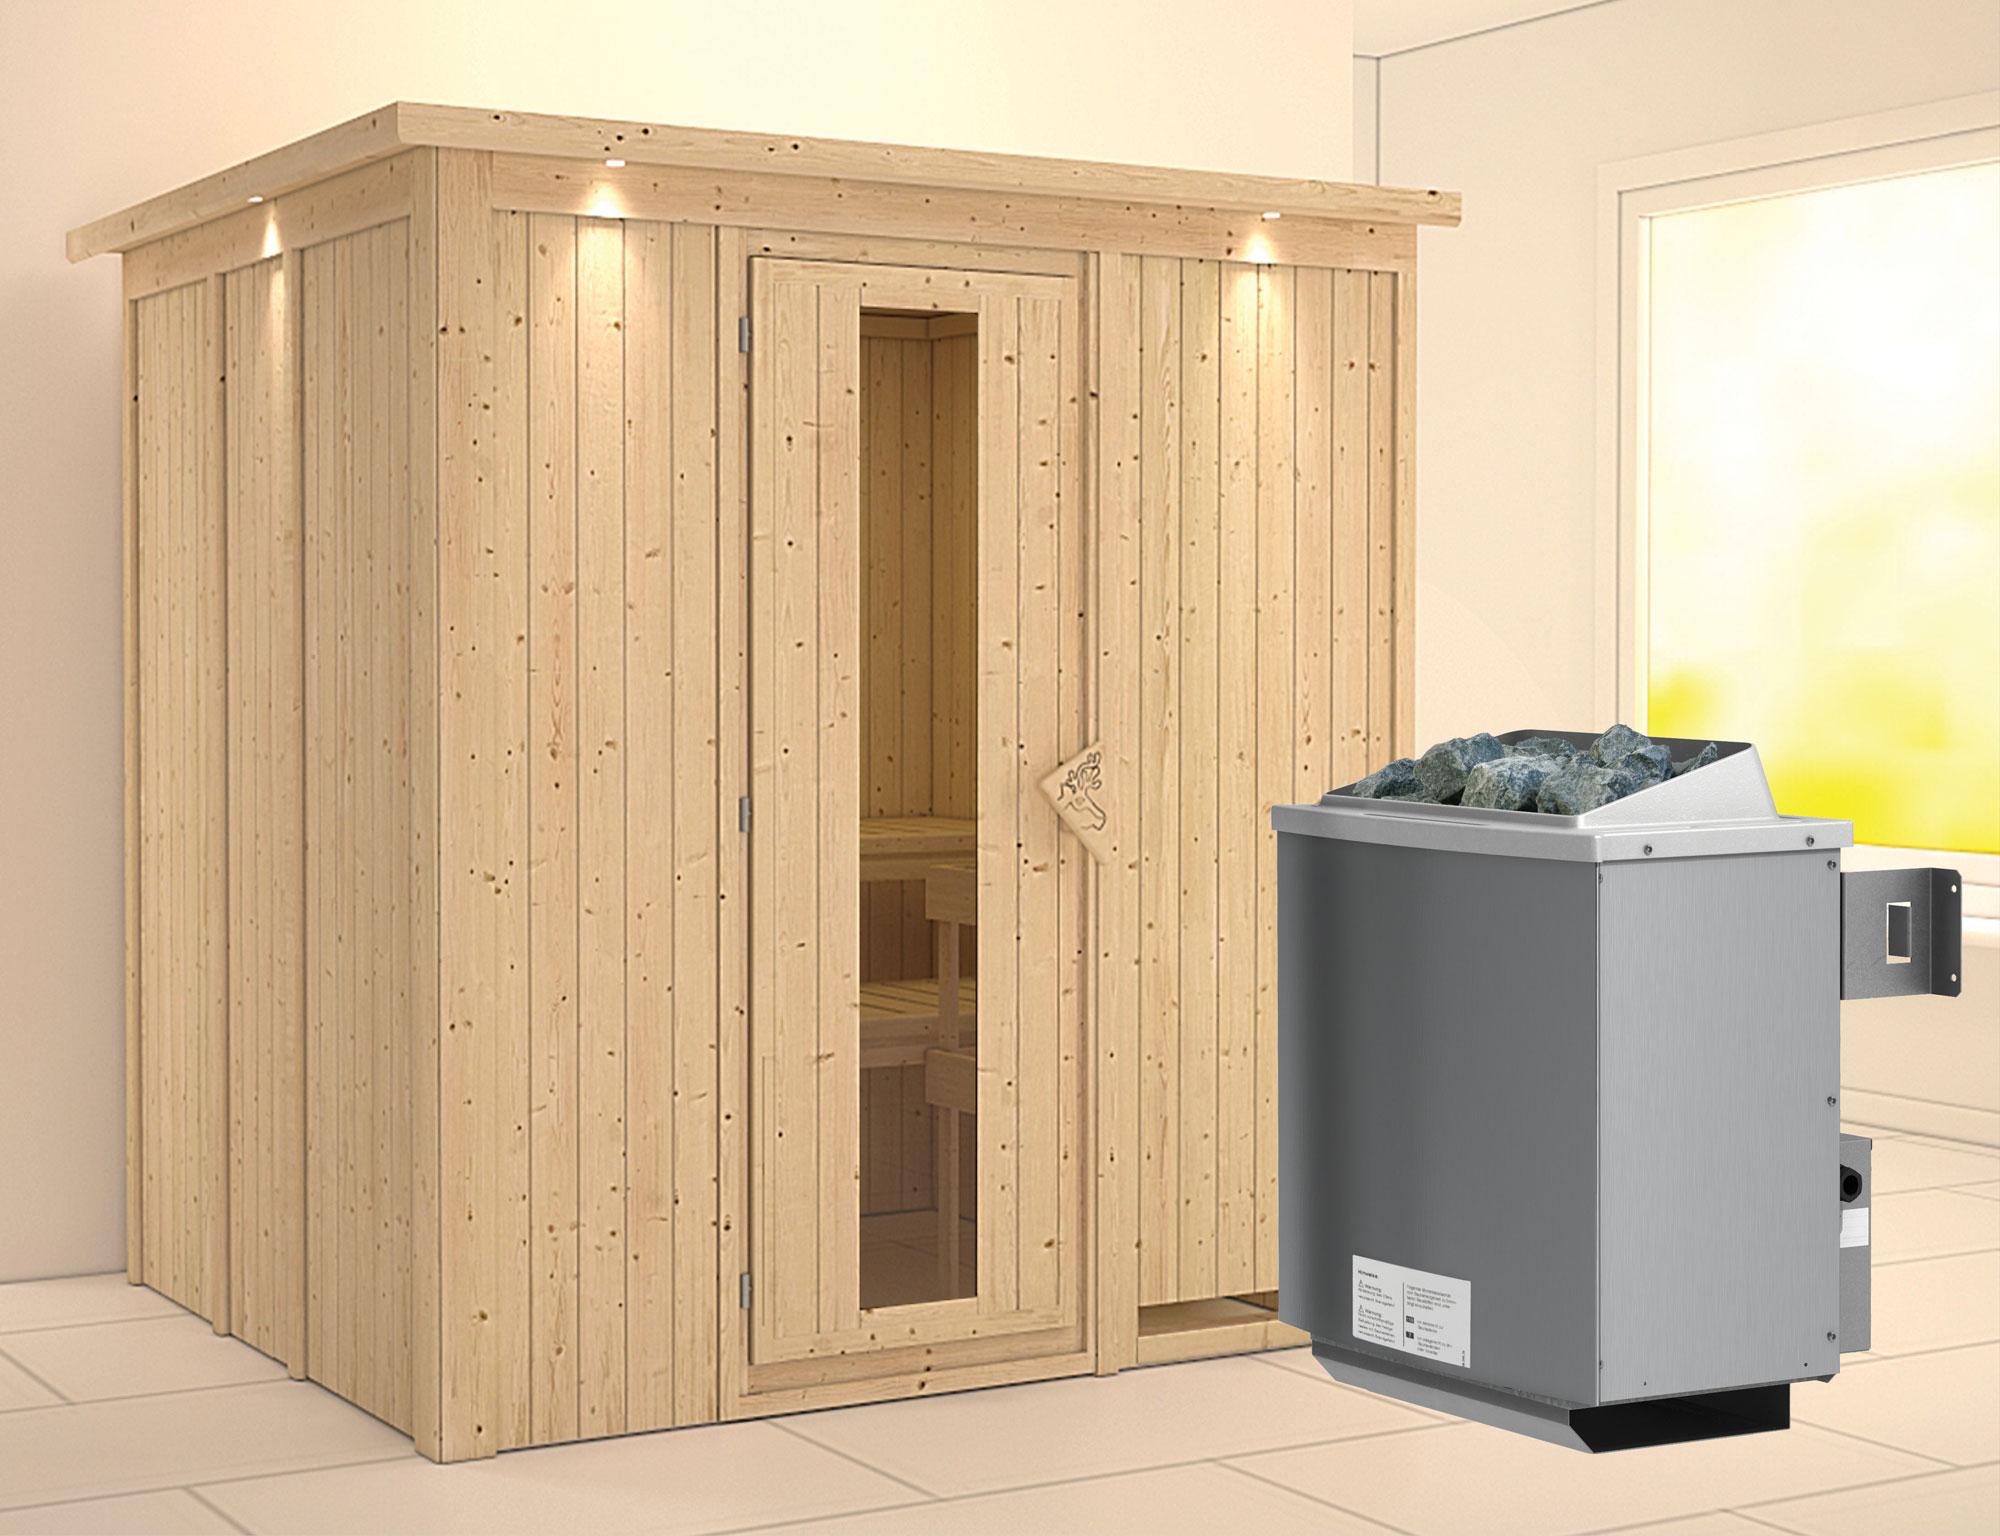 Karibu Sauna Sodin 68mm Dachkranz + Ofen 9kW intern Holztür Bild 1